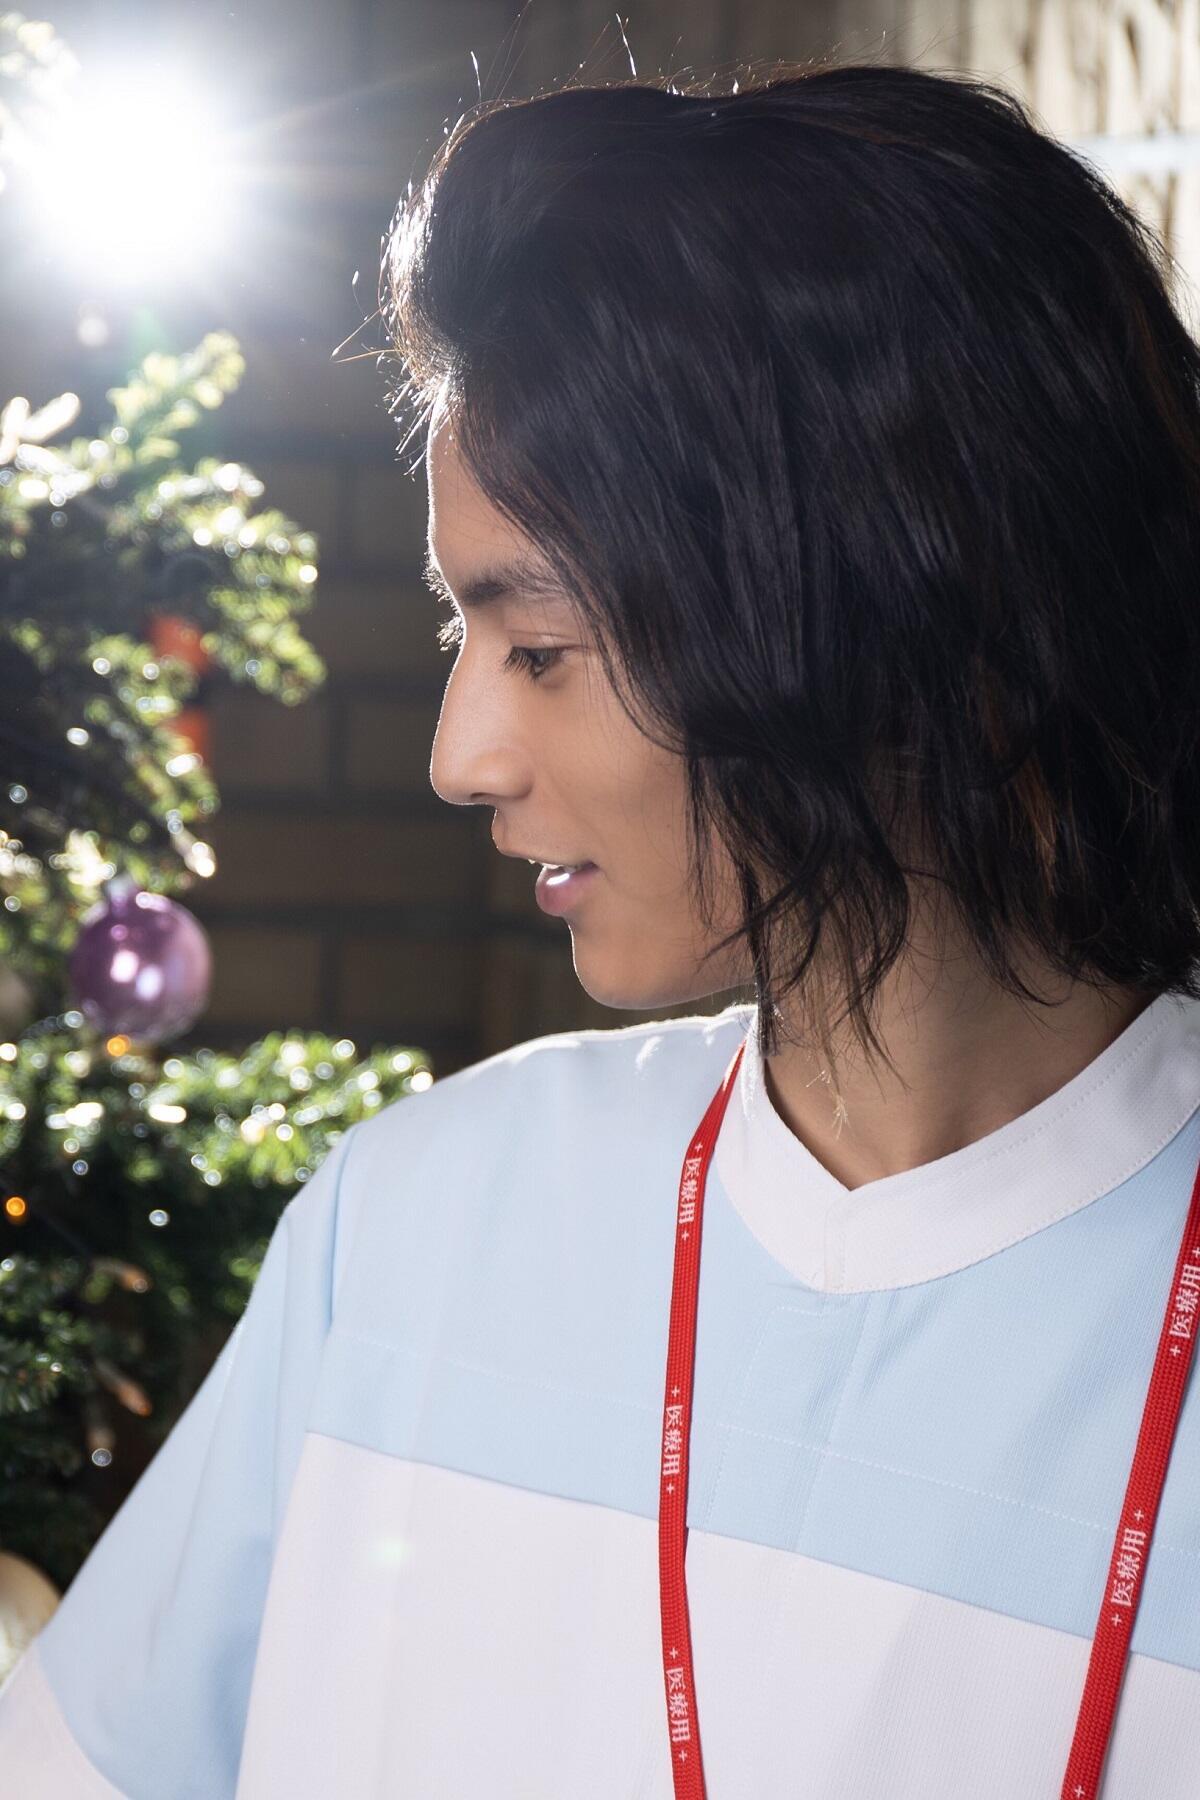 20200128_oshidan_03.JPG